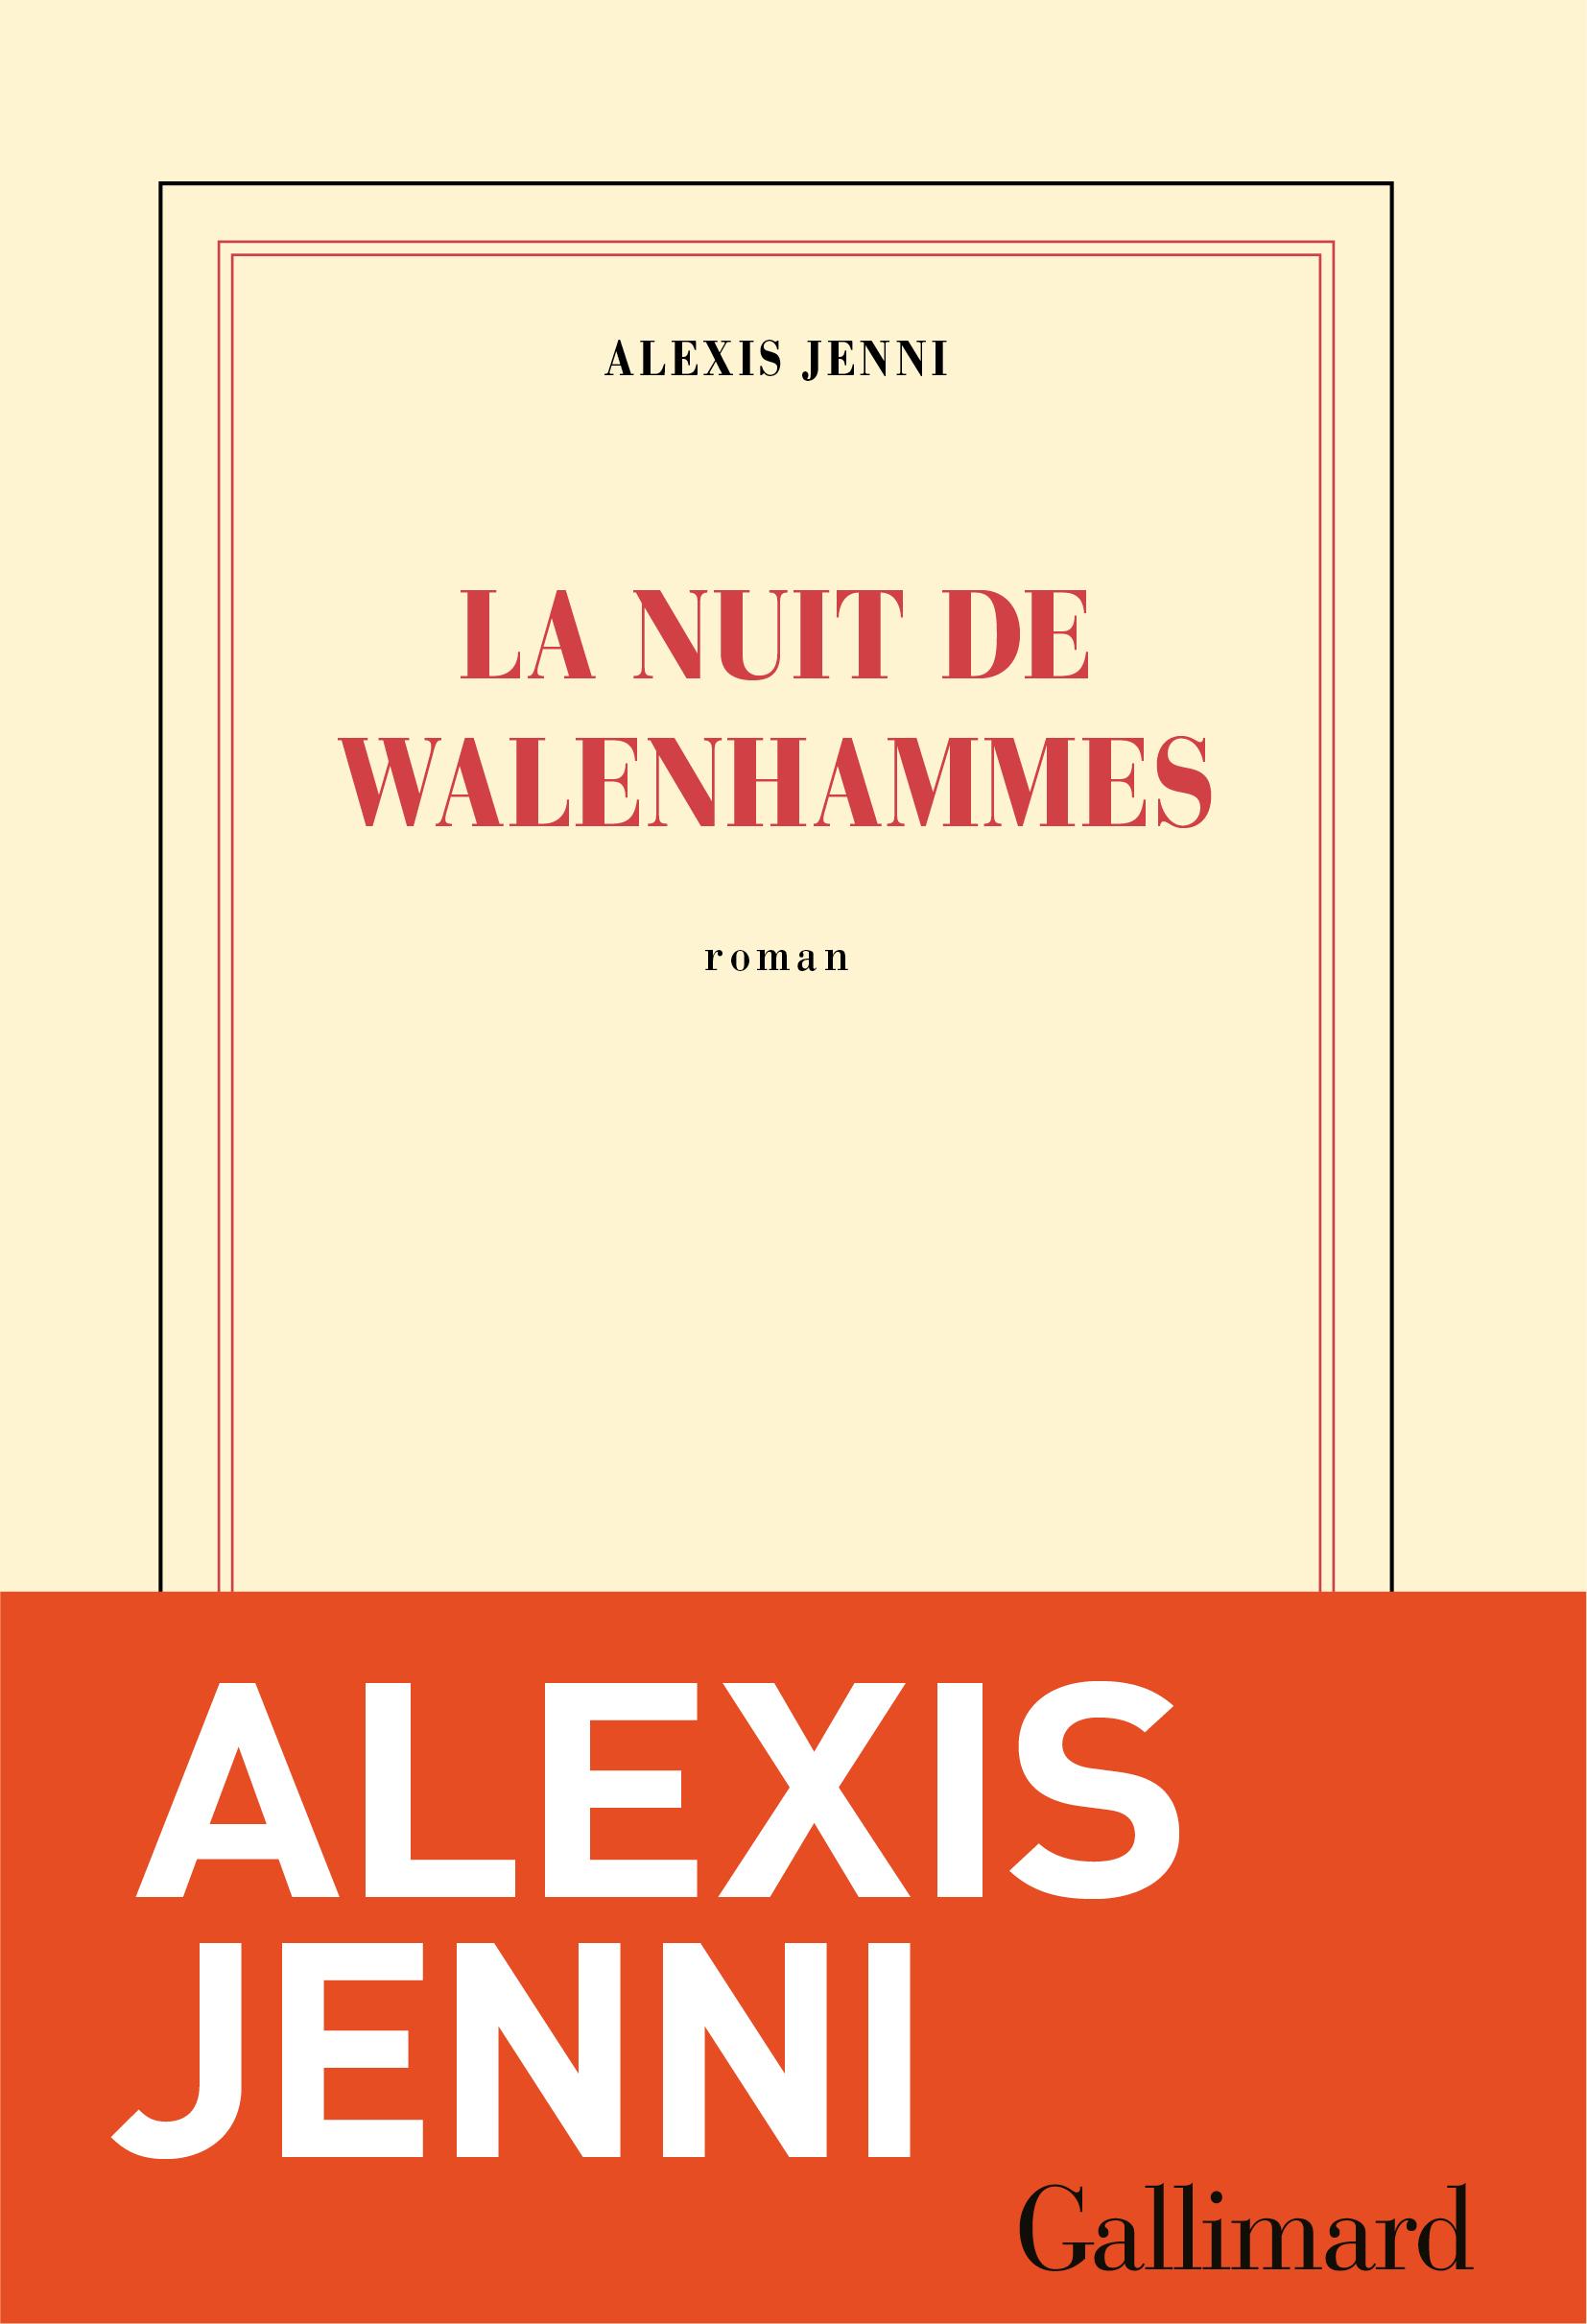 La nuit de Walenhammes |